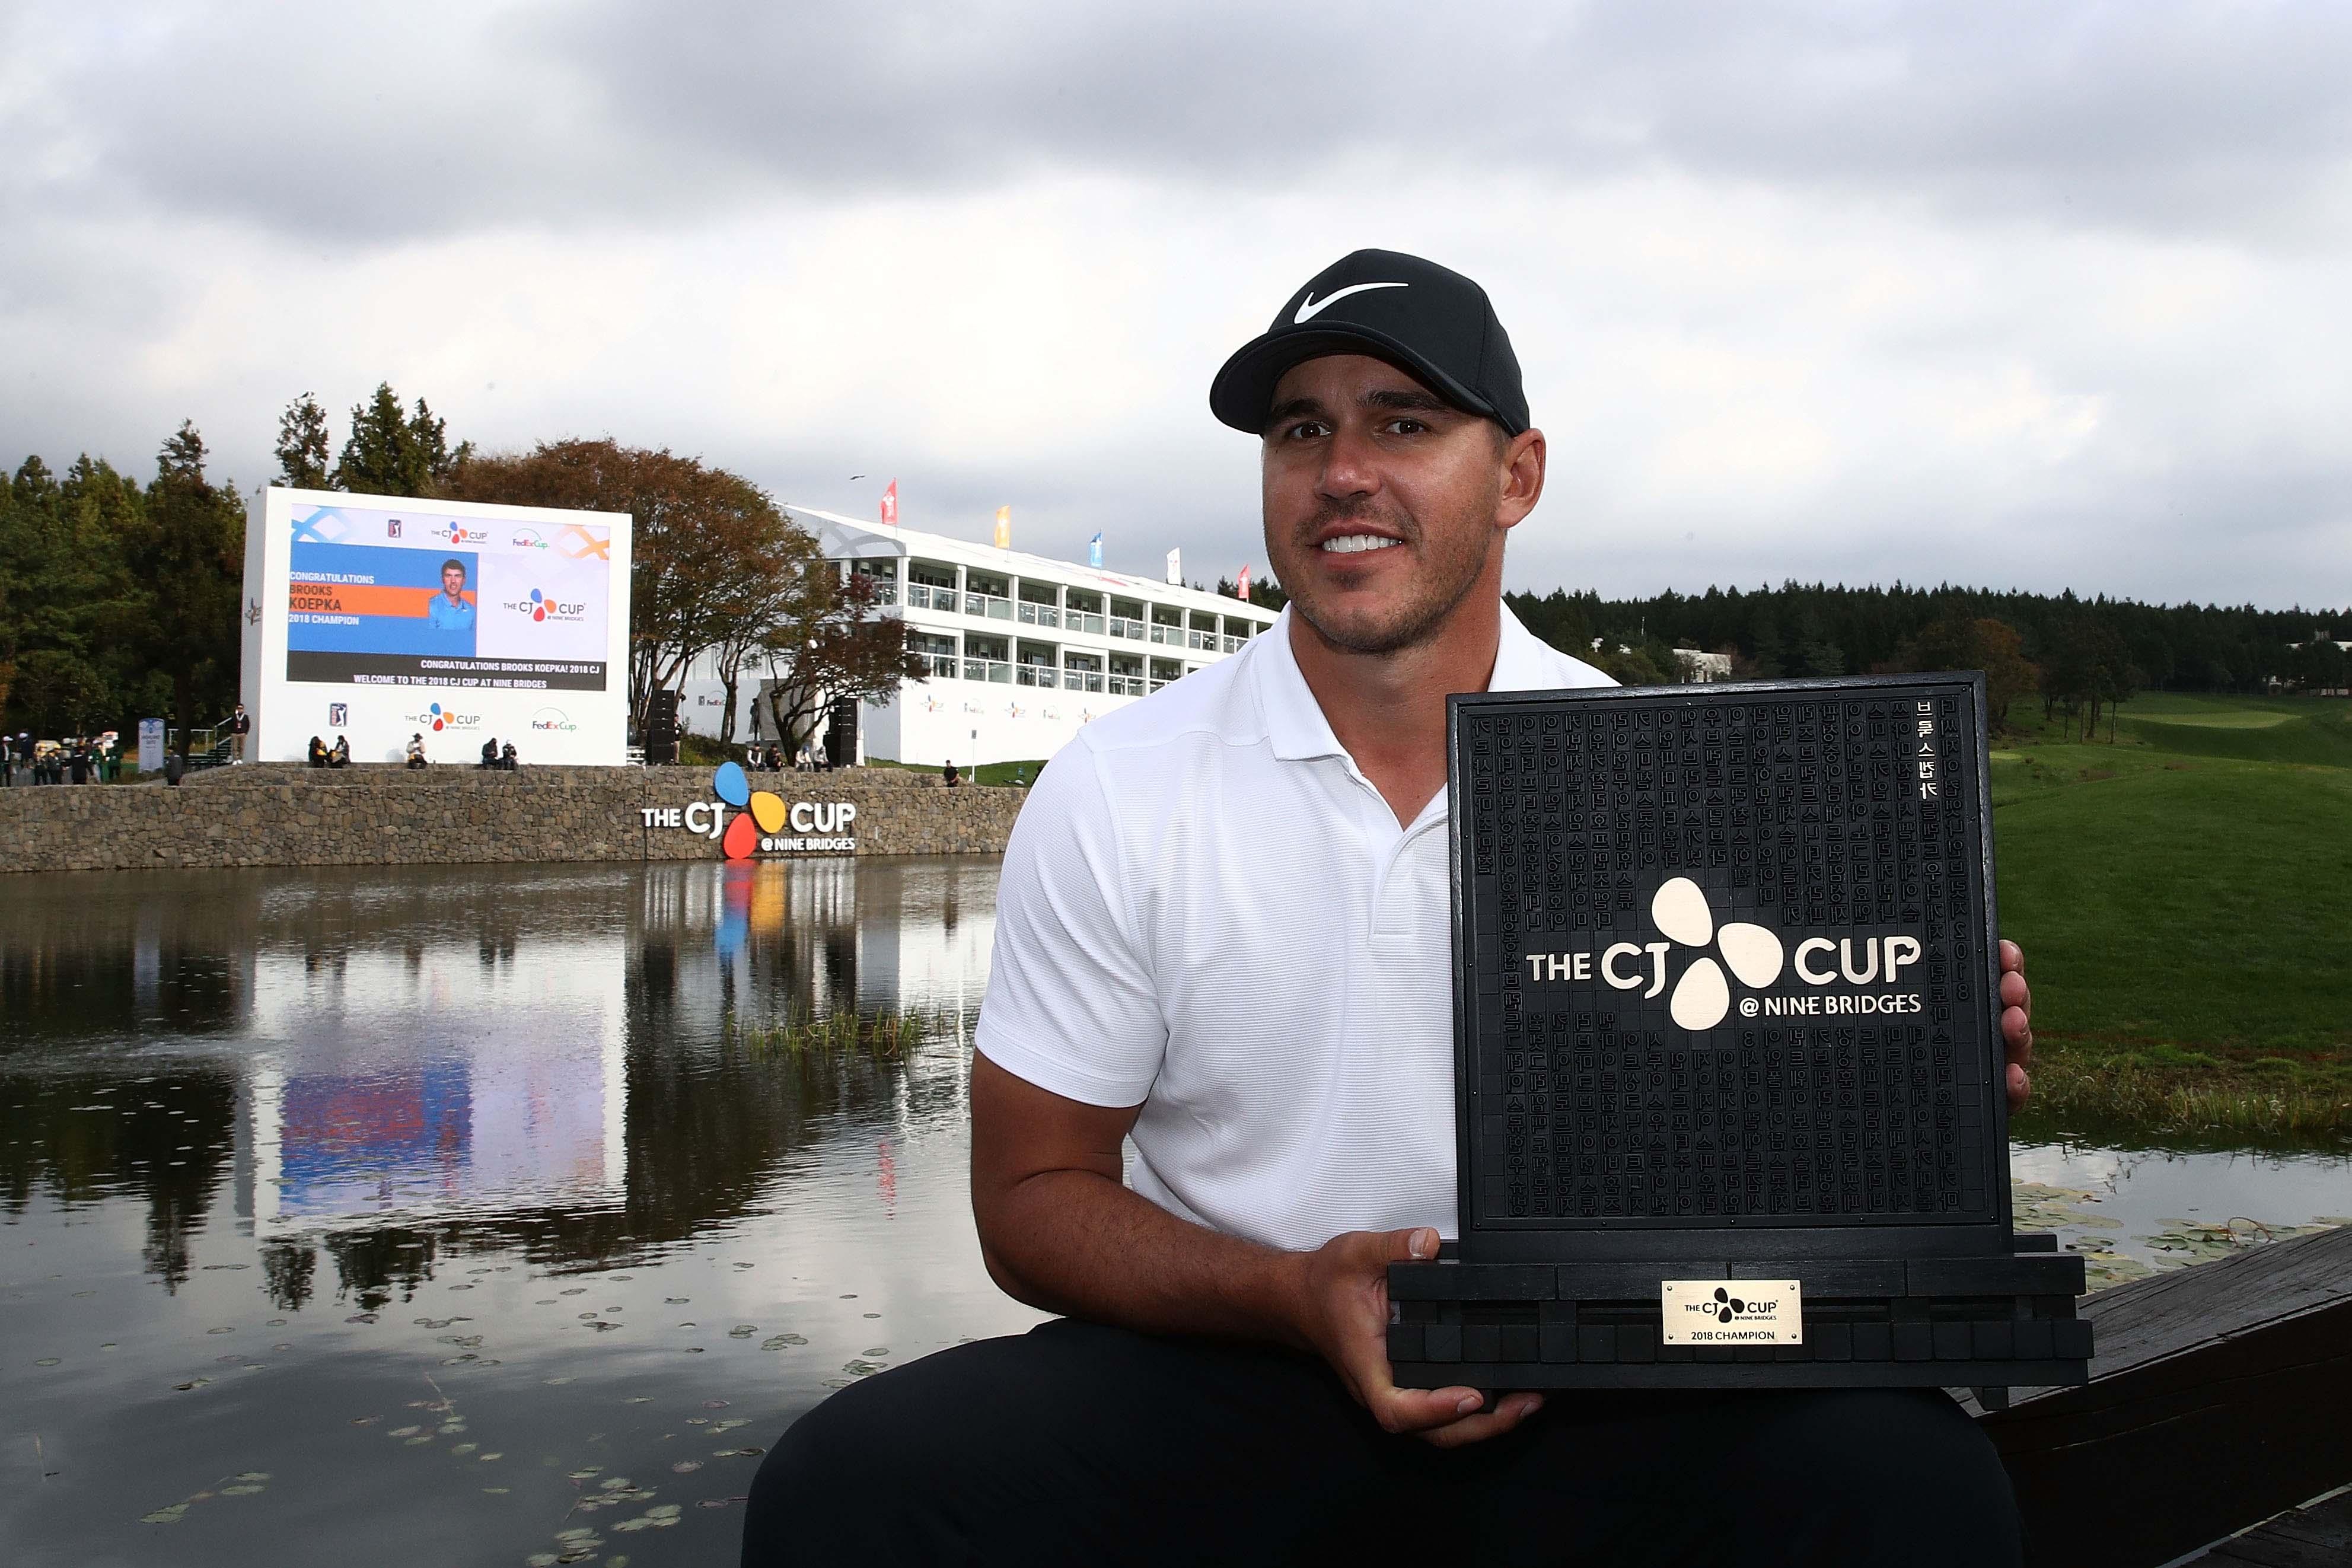 CJ Cup: Brooks Koepka